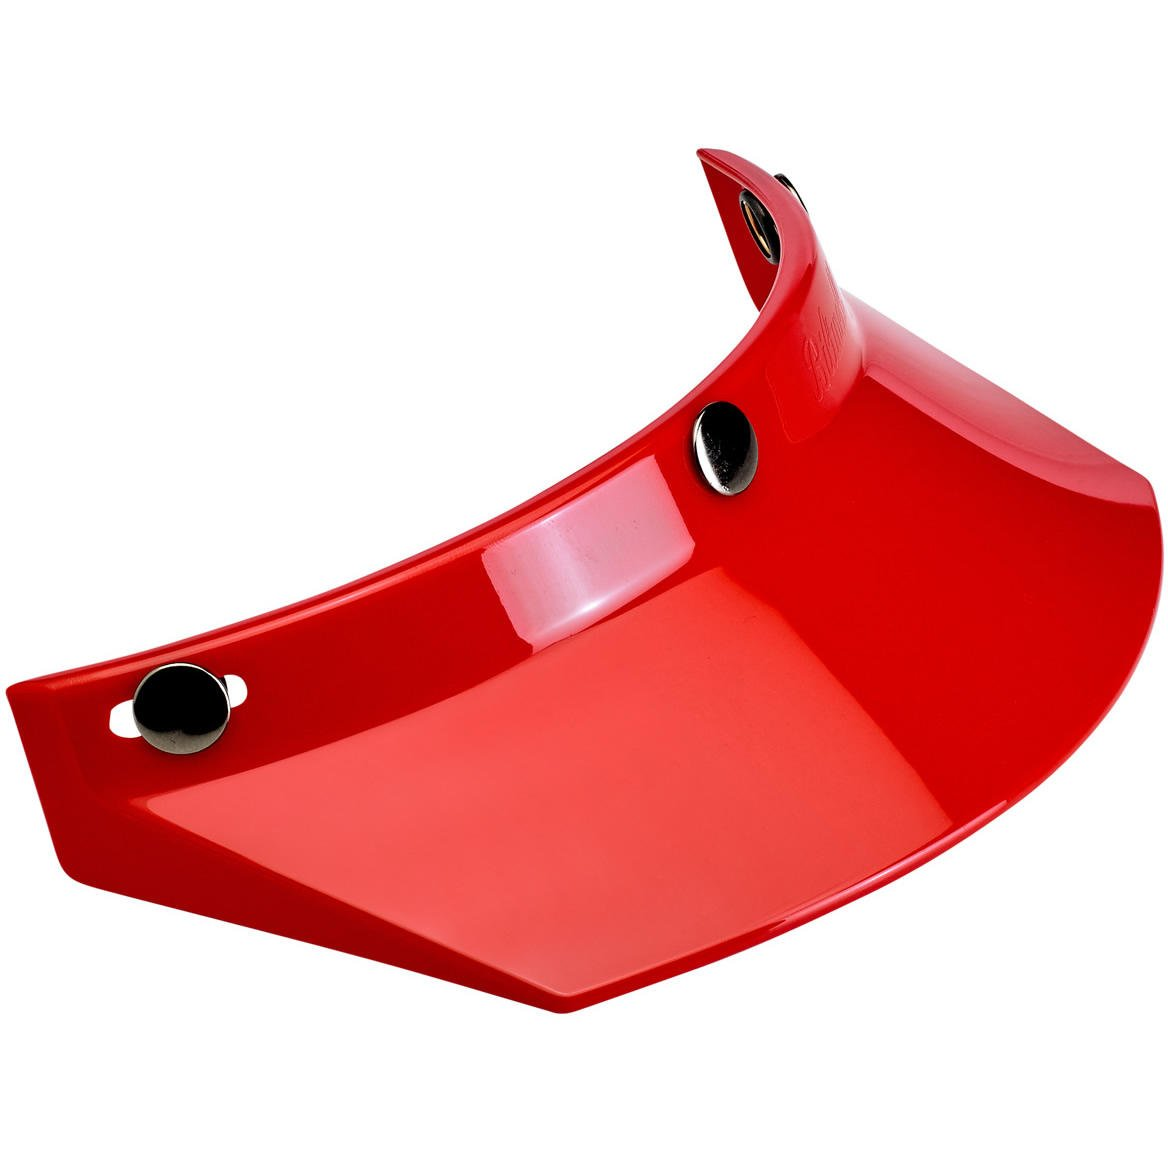 Biltwell Unisex-Adult 3 Snap Moto Visor (Red, Fits All) MV-RED-00-SD